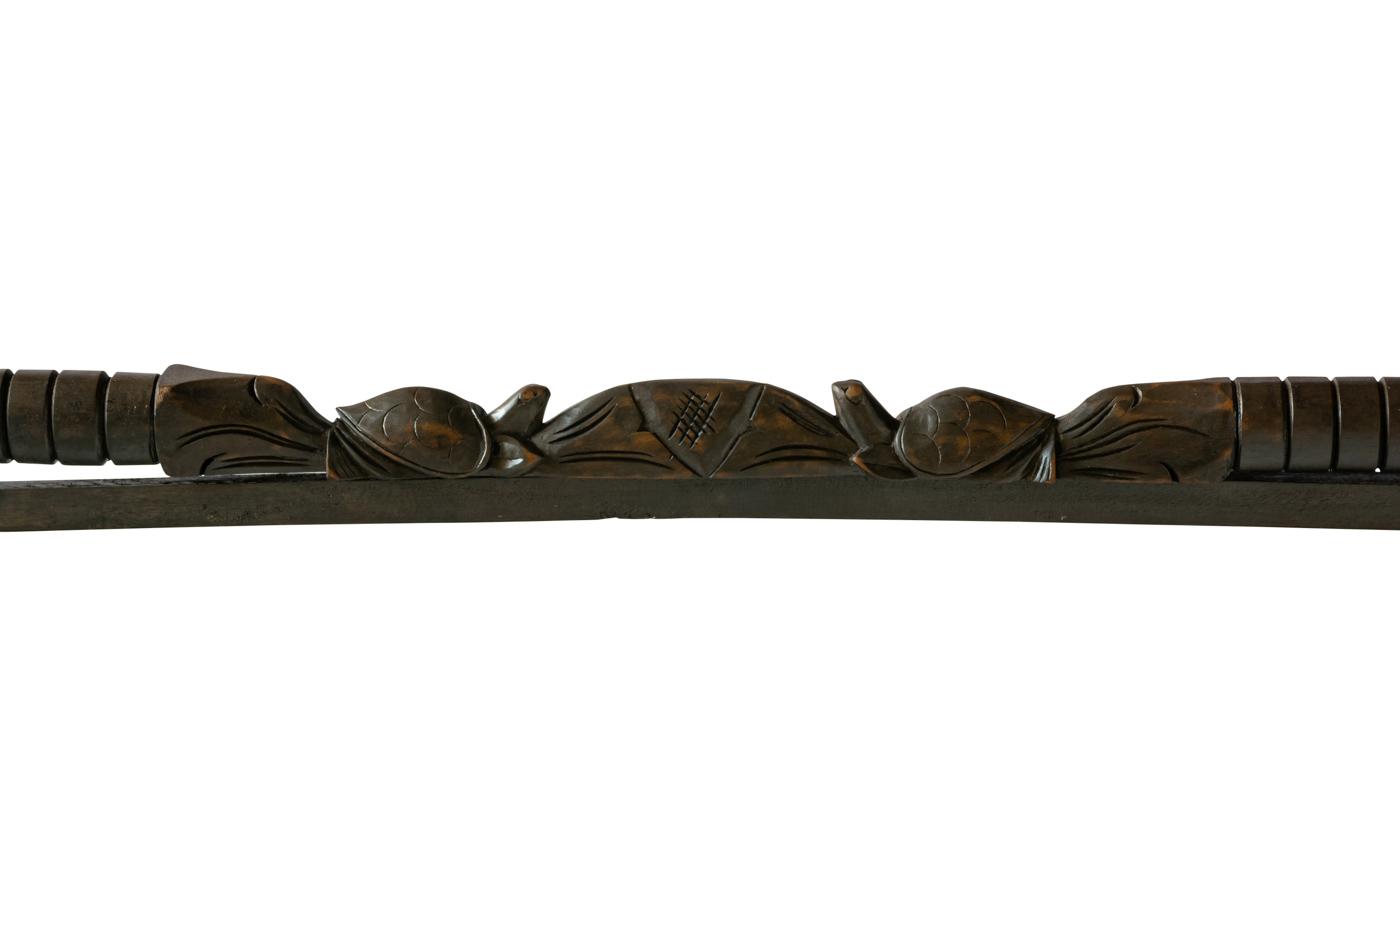 Soporte de pared para textiles en madera diseño tortugas